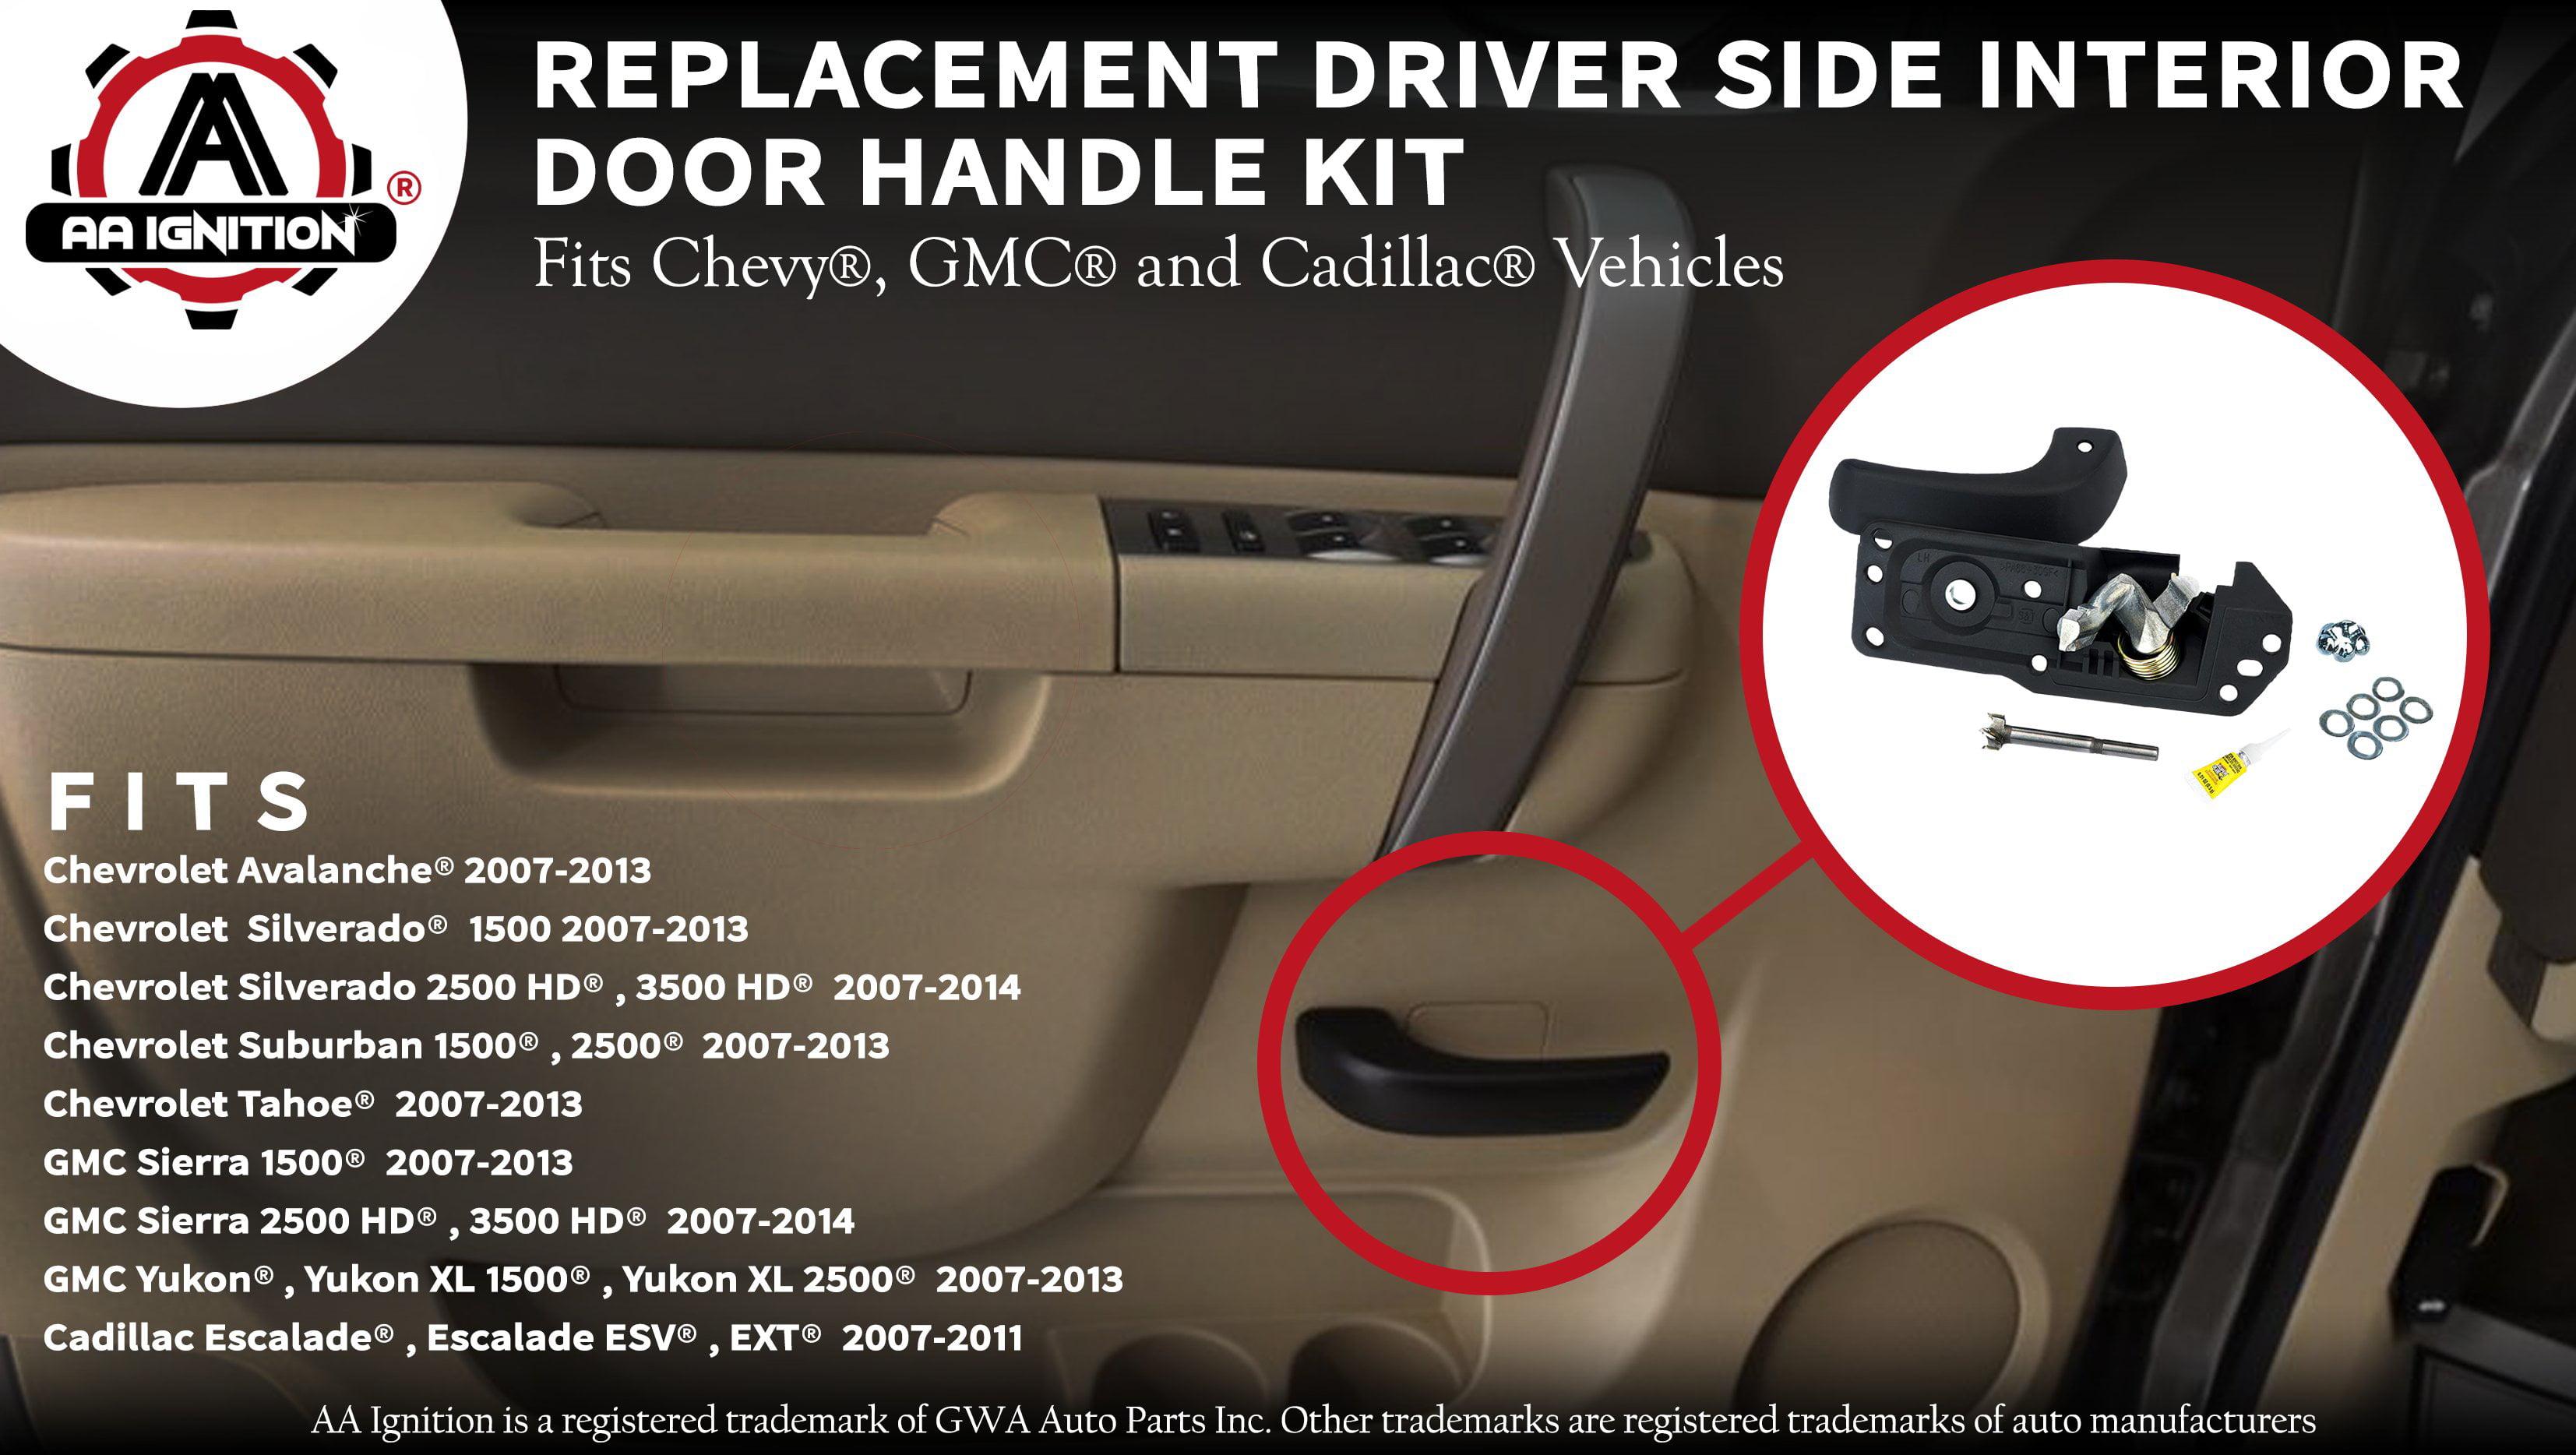 Interior Door Handle Kit Front Drivers Side For Chevy Silverado Tahoe Suburban Avalanche Gmc Sierra Yukon Xl Cadillac Escalade 2007 2017